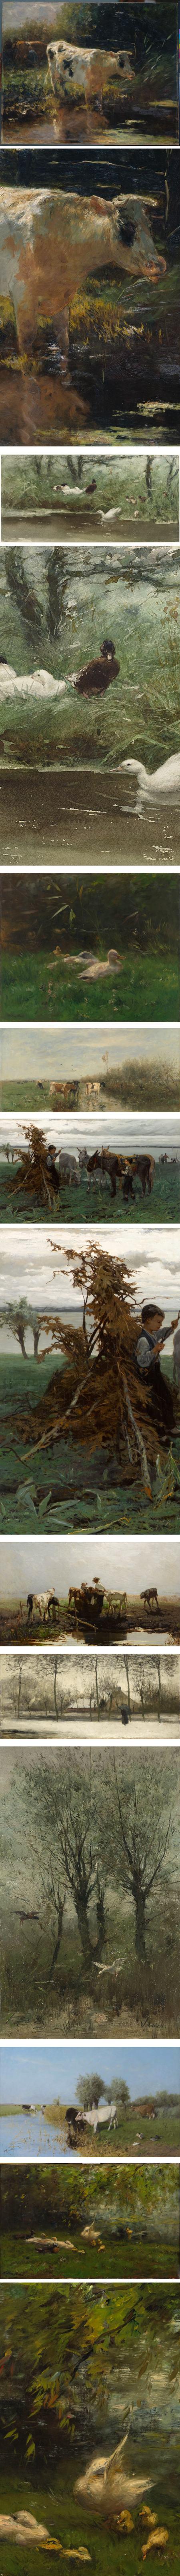 Willem Maris, 19th century Dutch painter, cows and ducks